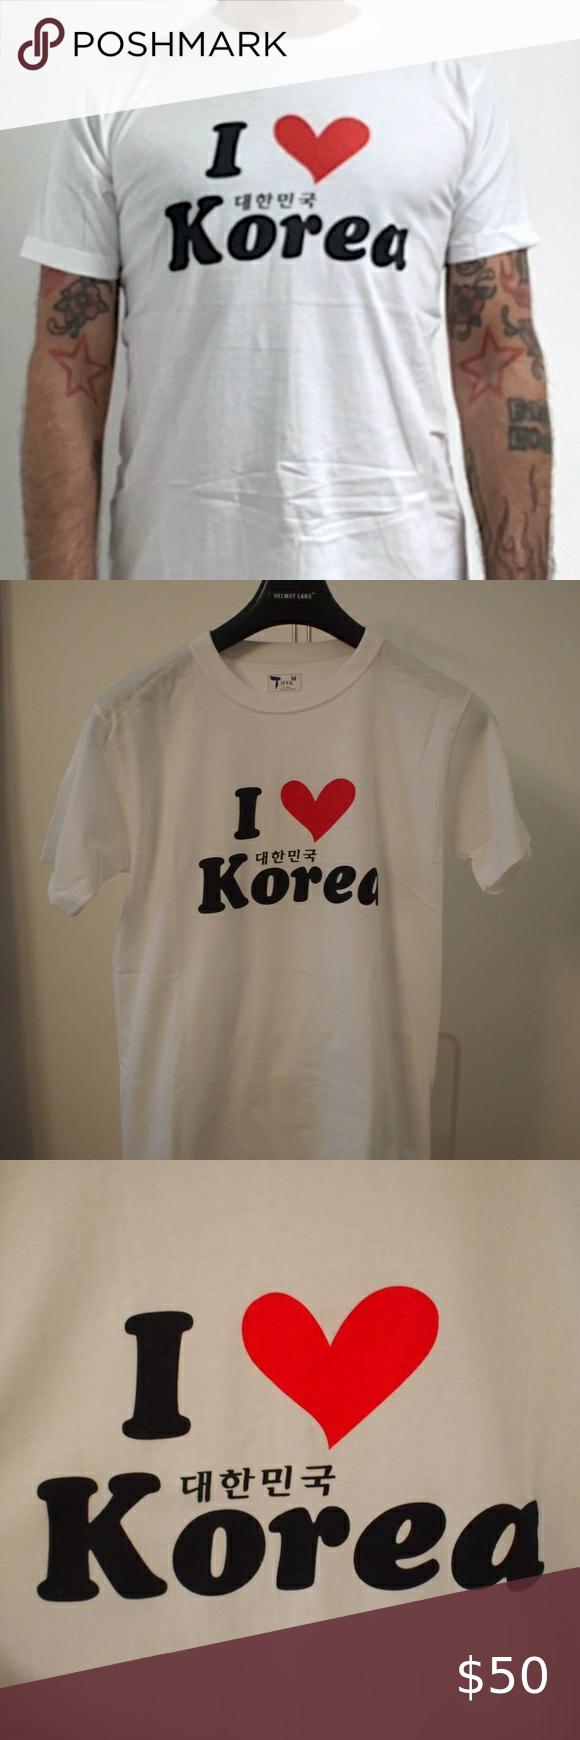 Baju Logo Love Merah